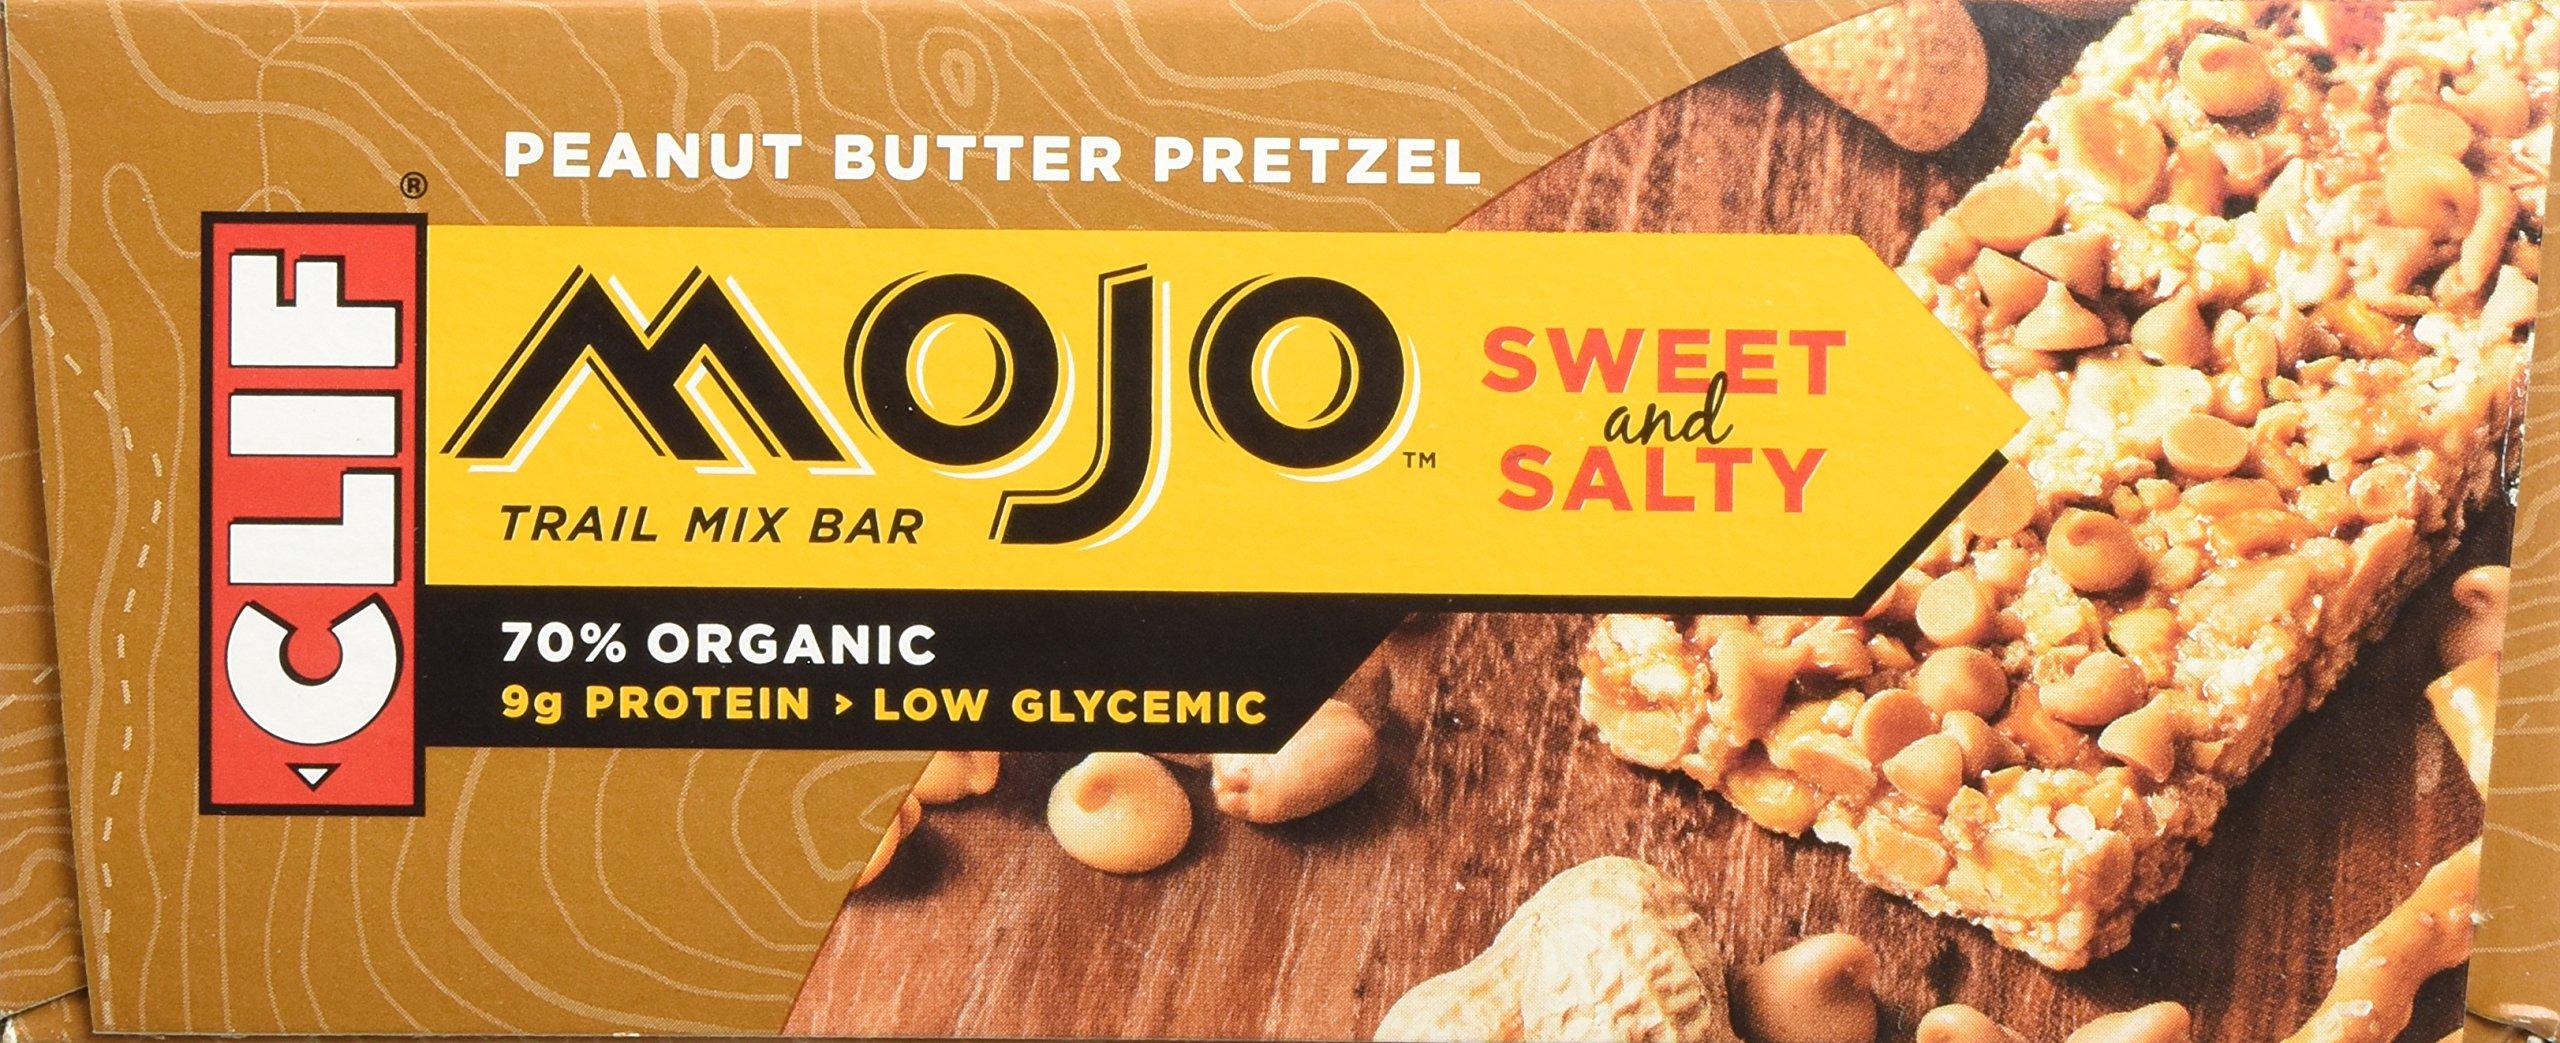 Clif Mojo Bar, Peanut Butter Pretzel, Net Wt. 19.08 Oz. 12 Count (Pack of 2) by Clif Bar (Image #8)